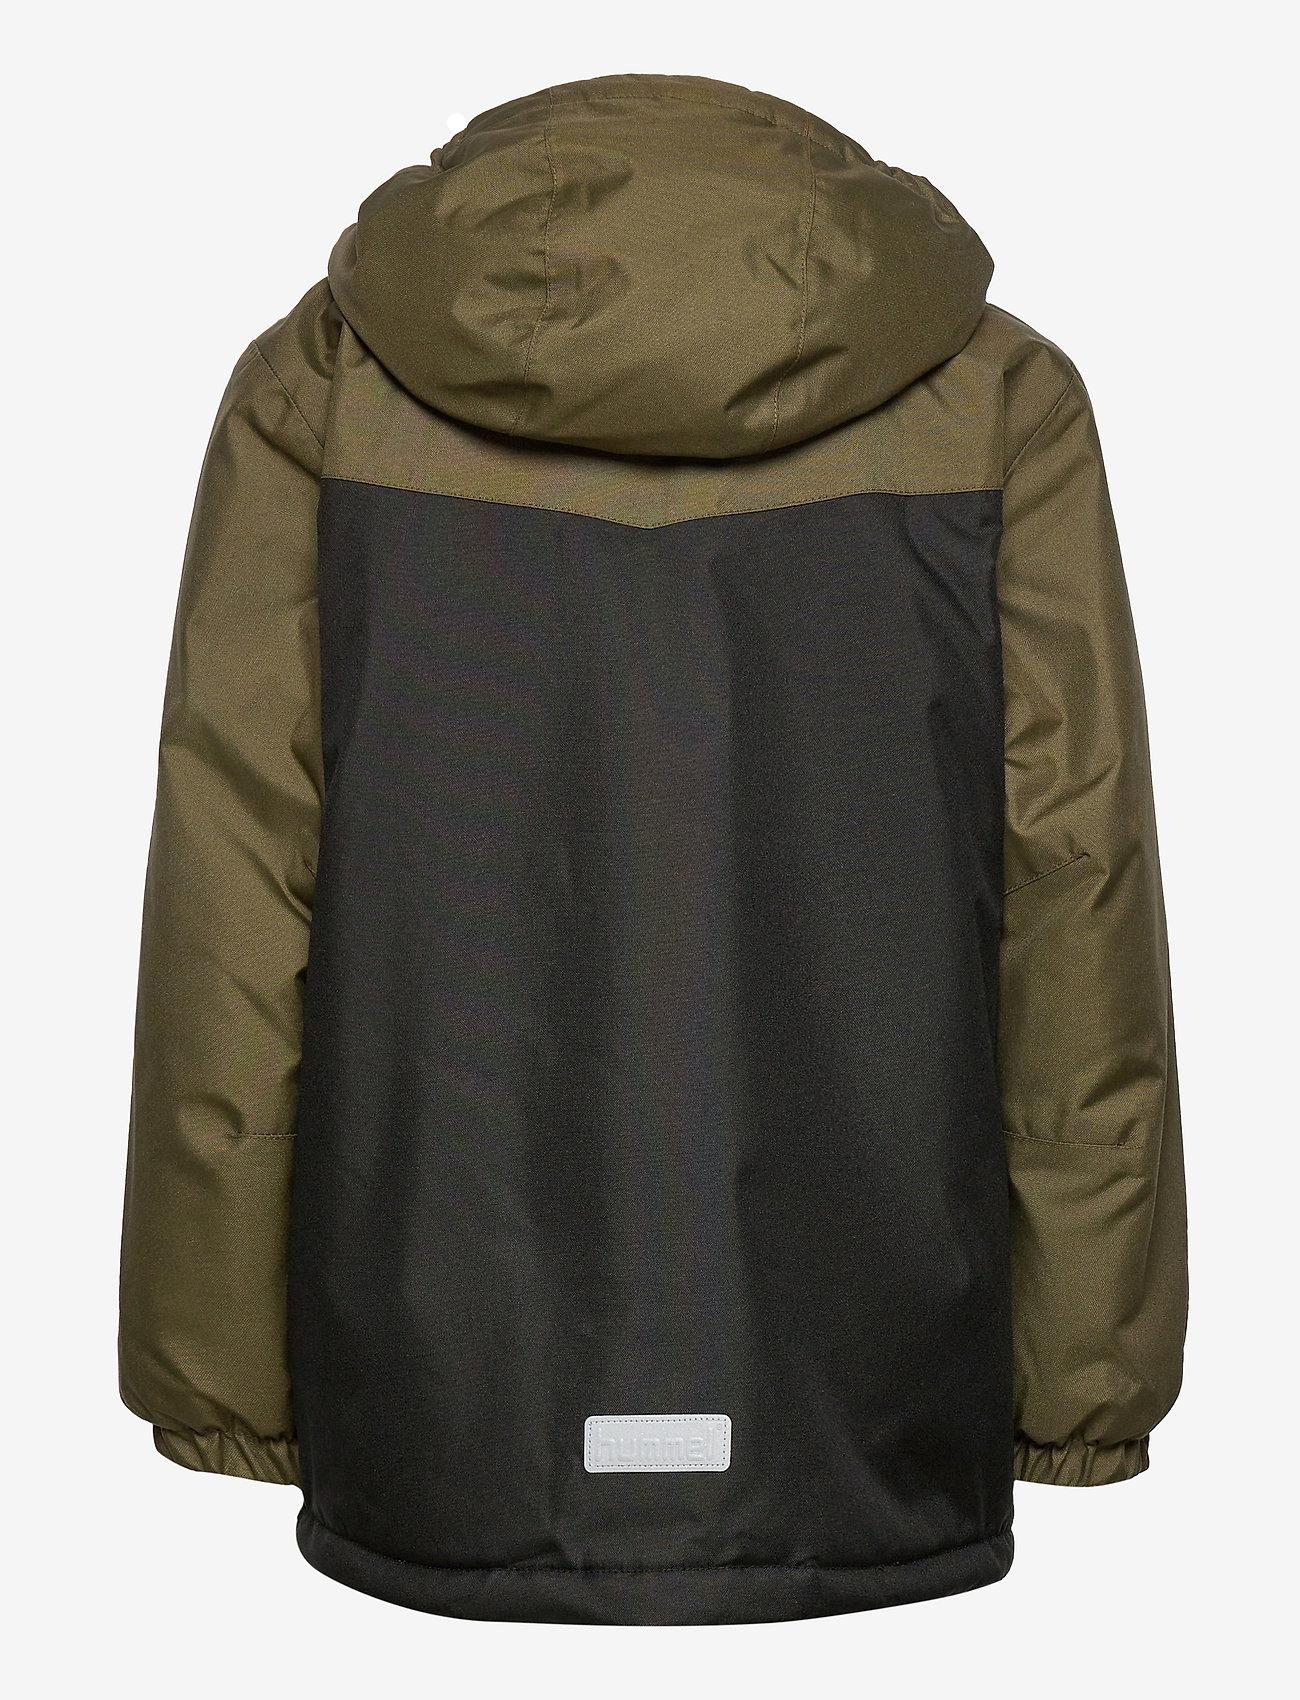 Hummel - hmlCONRAD JACKET - insulated jackets - olive night - 1